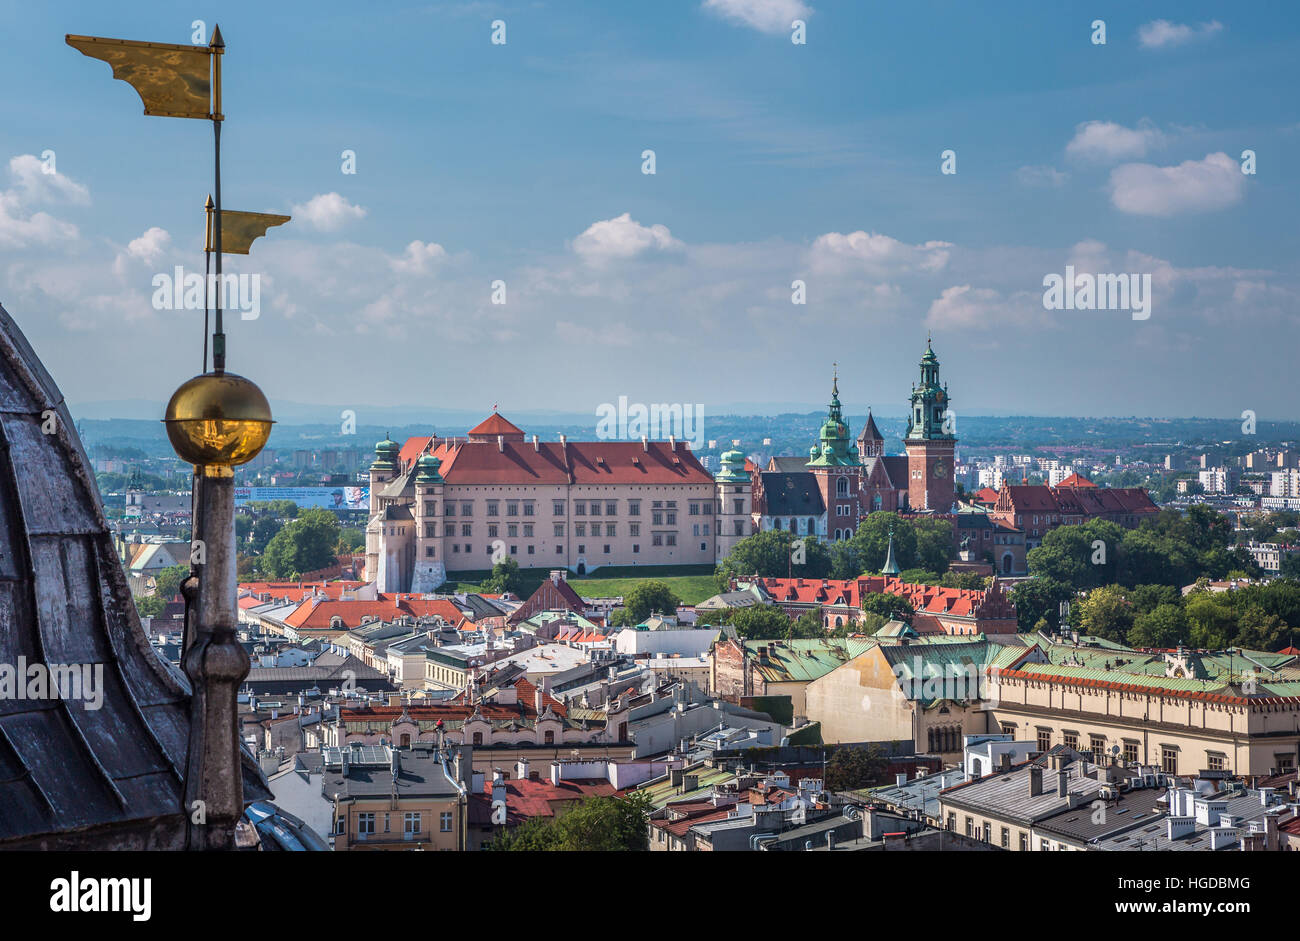 Wawel Royal Castle - Stock Image